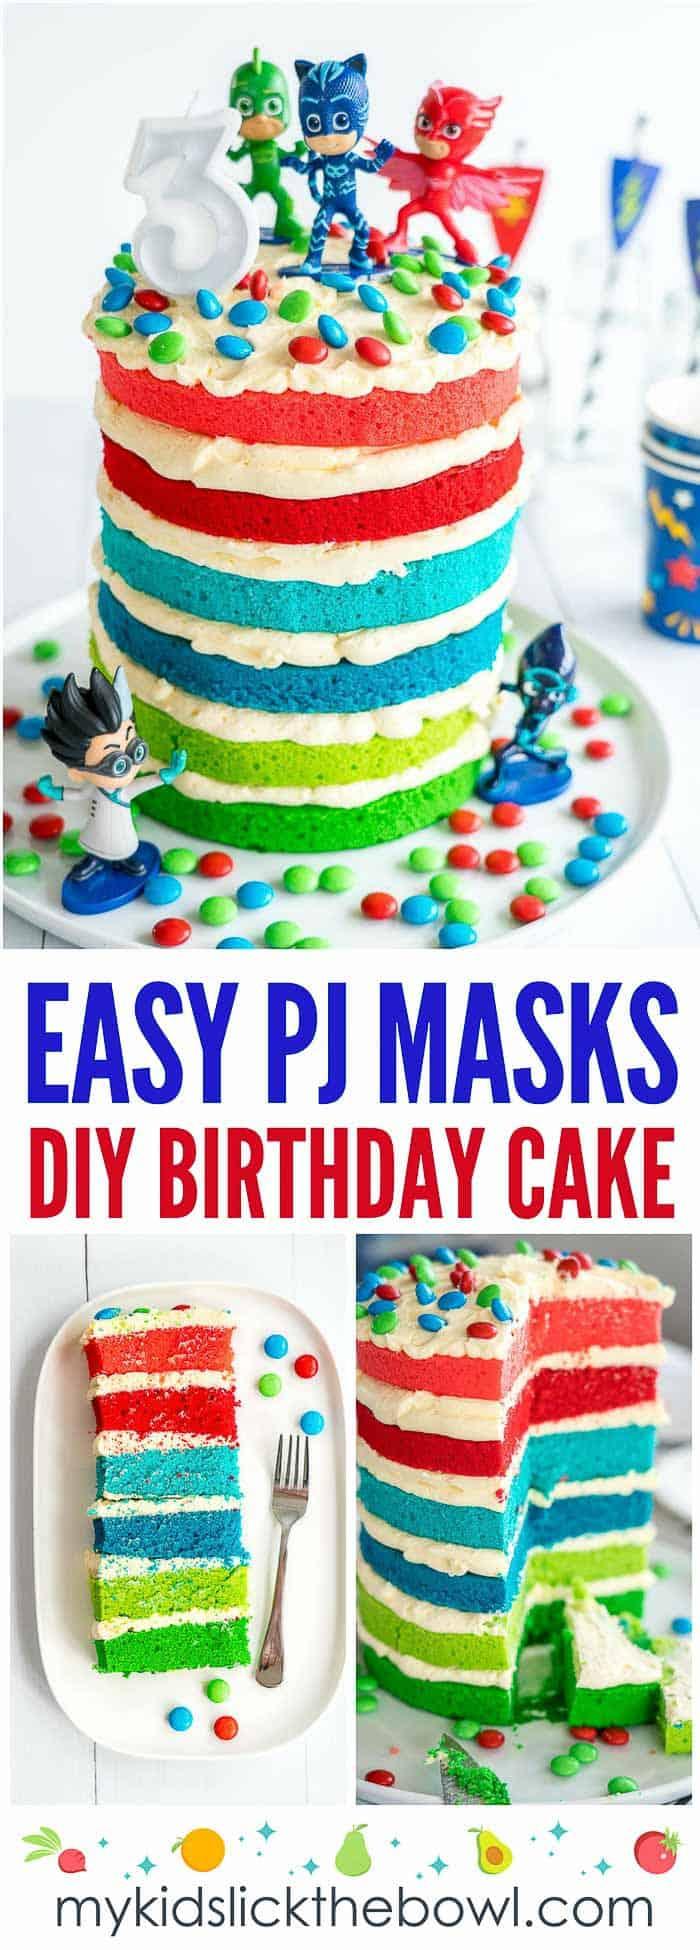 Boys Birthday Cake Pj Masks Cake Easy Diy Birthday Cake For Kids